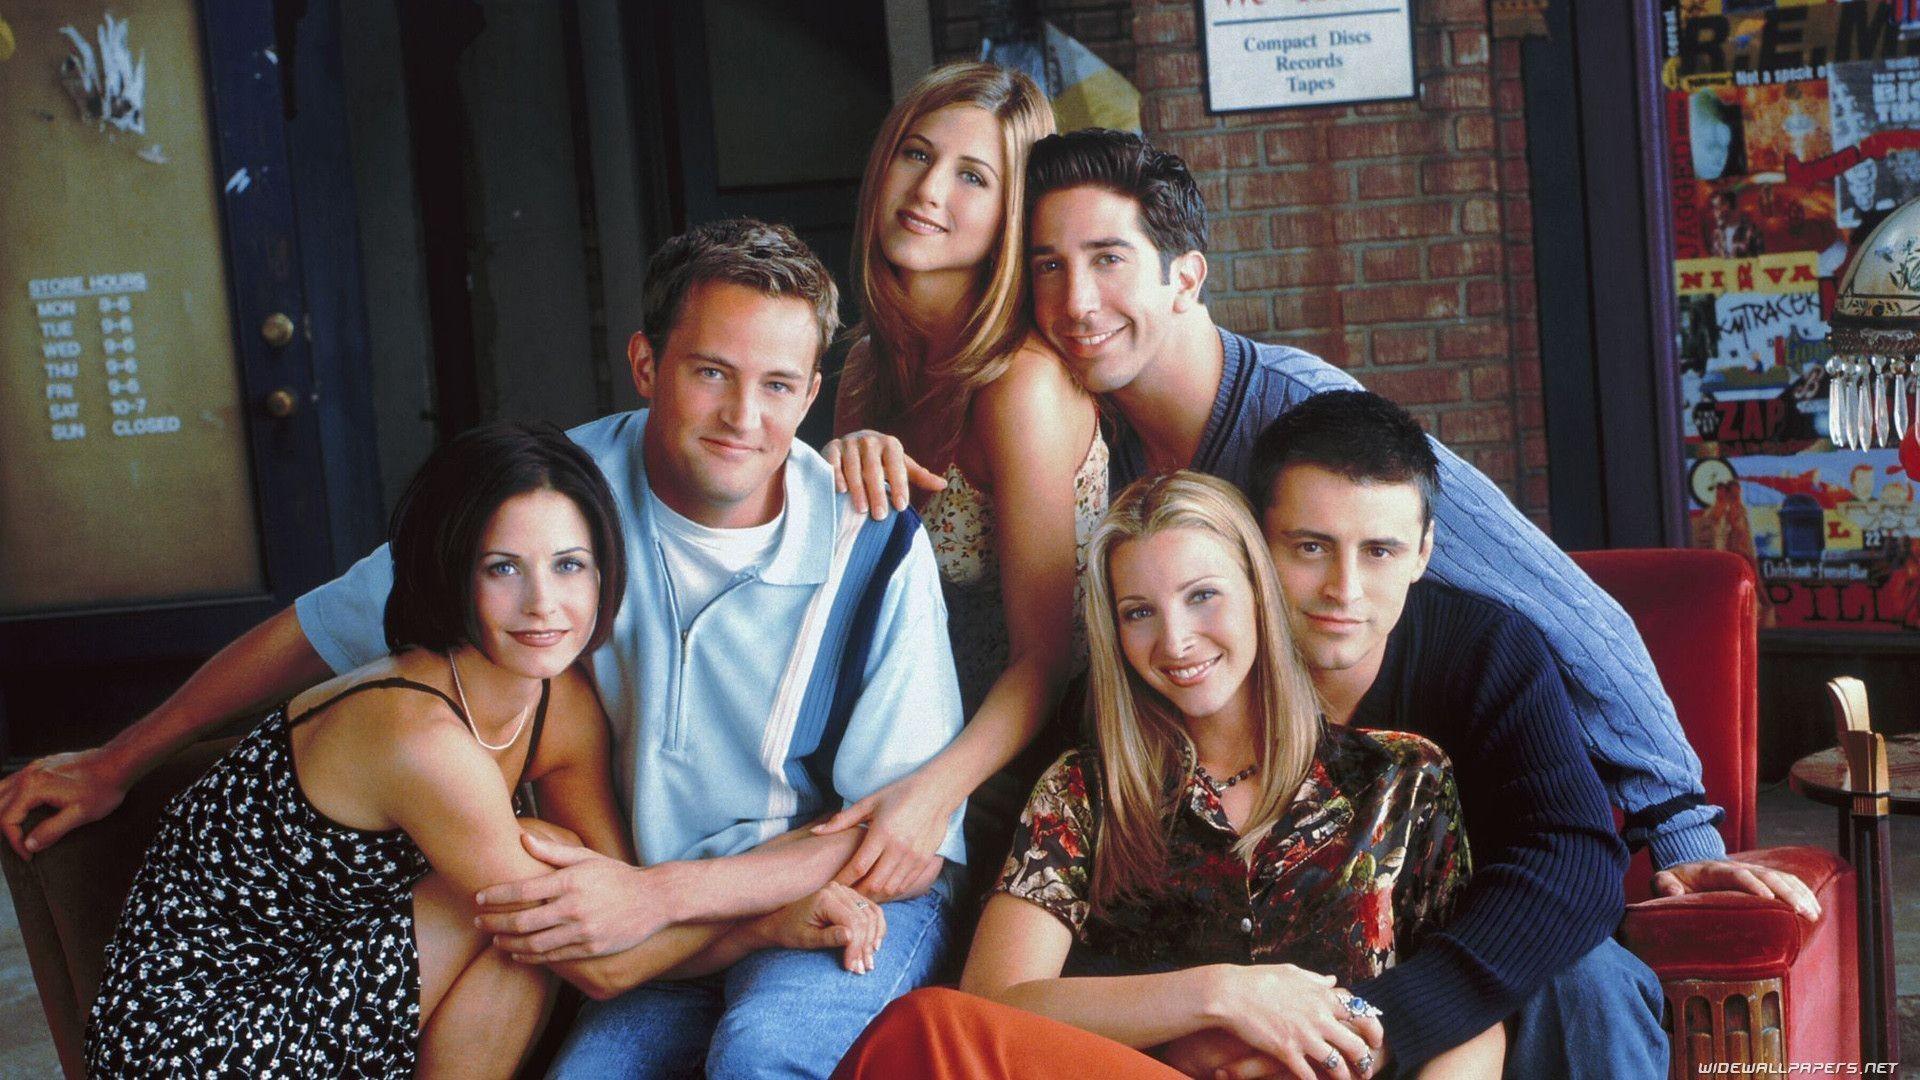 Ceedaeeacf768ecf Friends Episodes Friends Tv Show Wallpaper - Friends Tv Show Wallpaper Hd , HD Wallpaper & Backgrounds